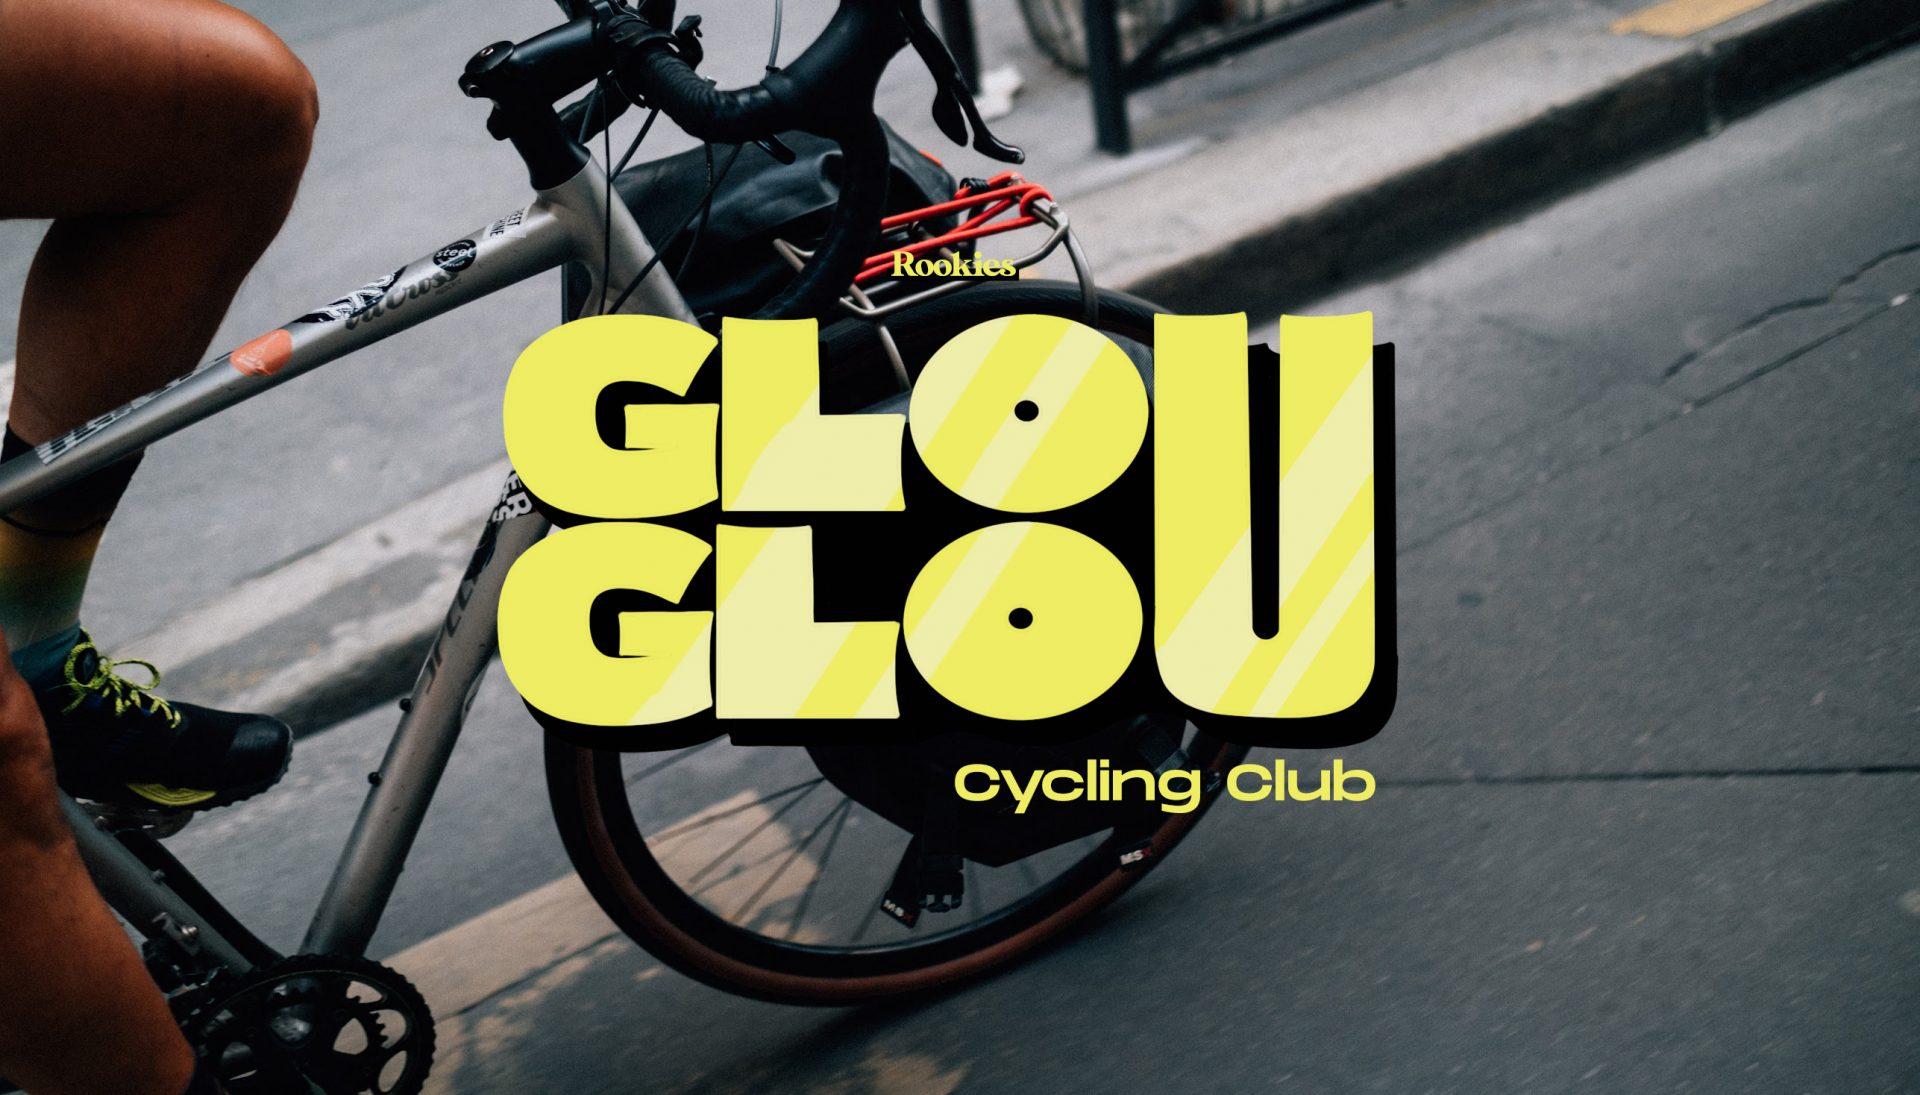 GLOU GLOU Cycling Club